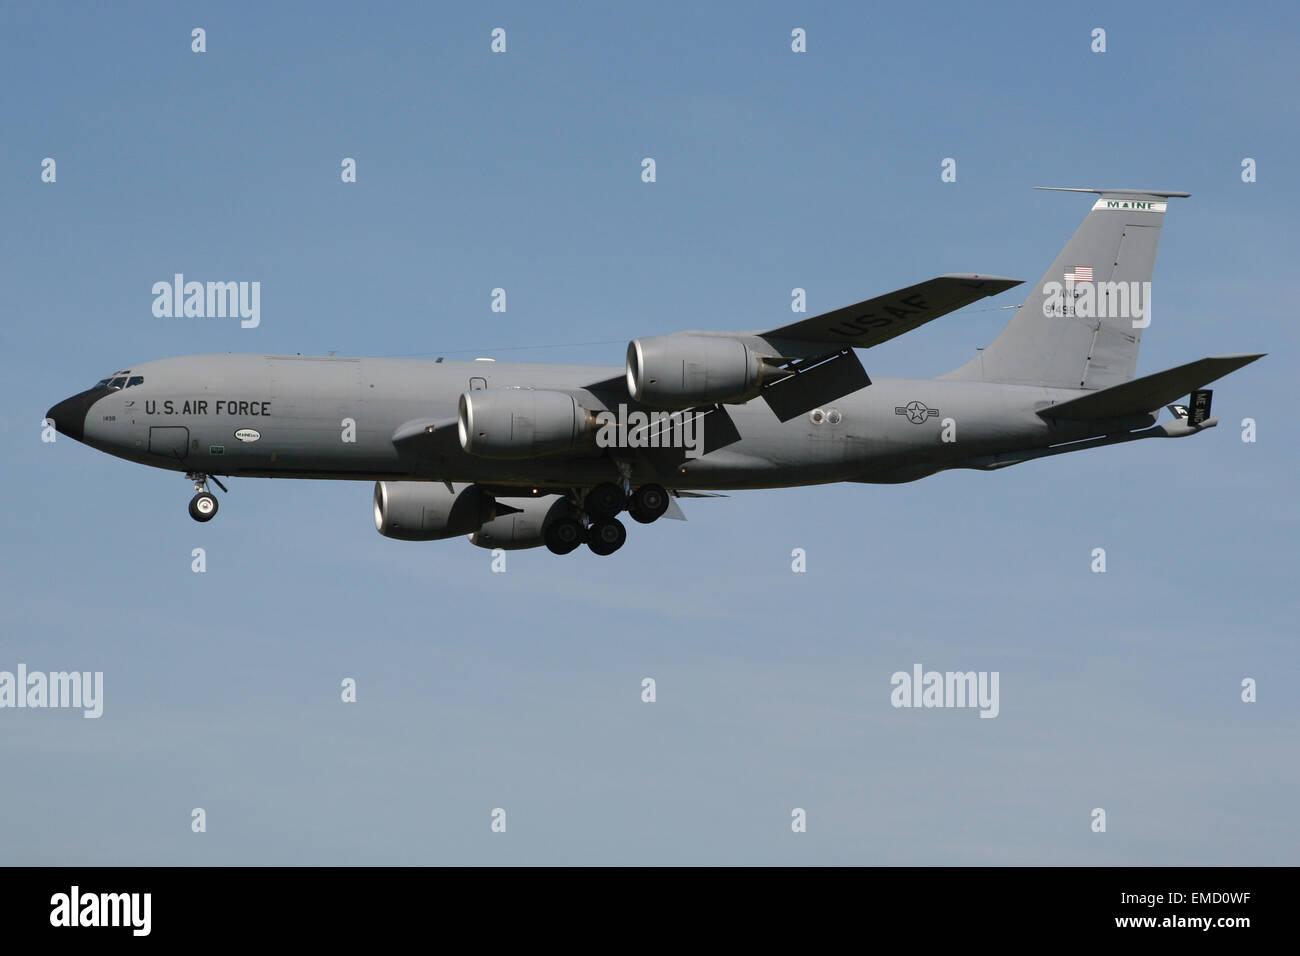 USAF US AIR FORCE KC135 TANKER - Stock Image